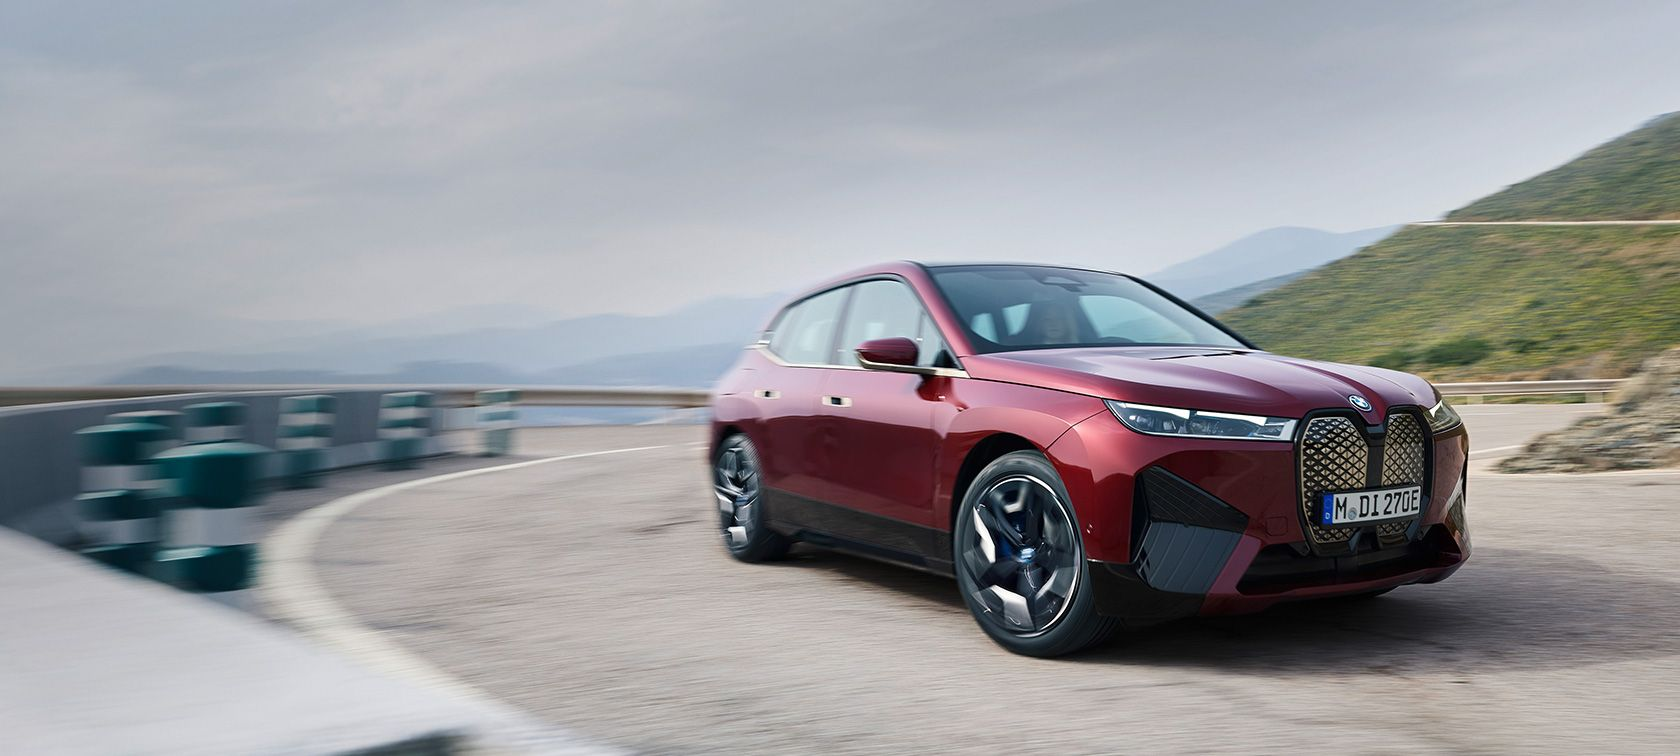 PRVI BMW iX: PIONIR NOVOG DOBA